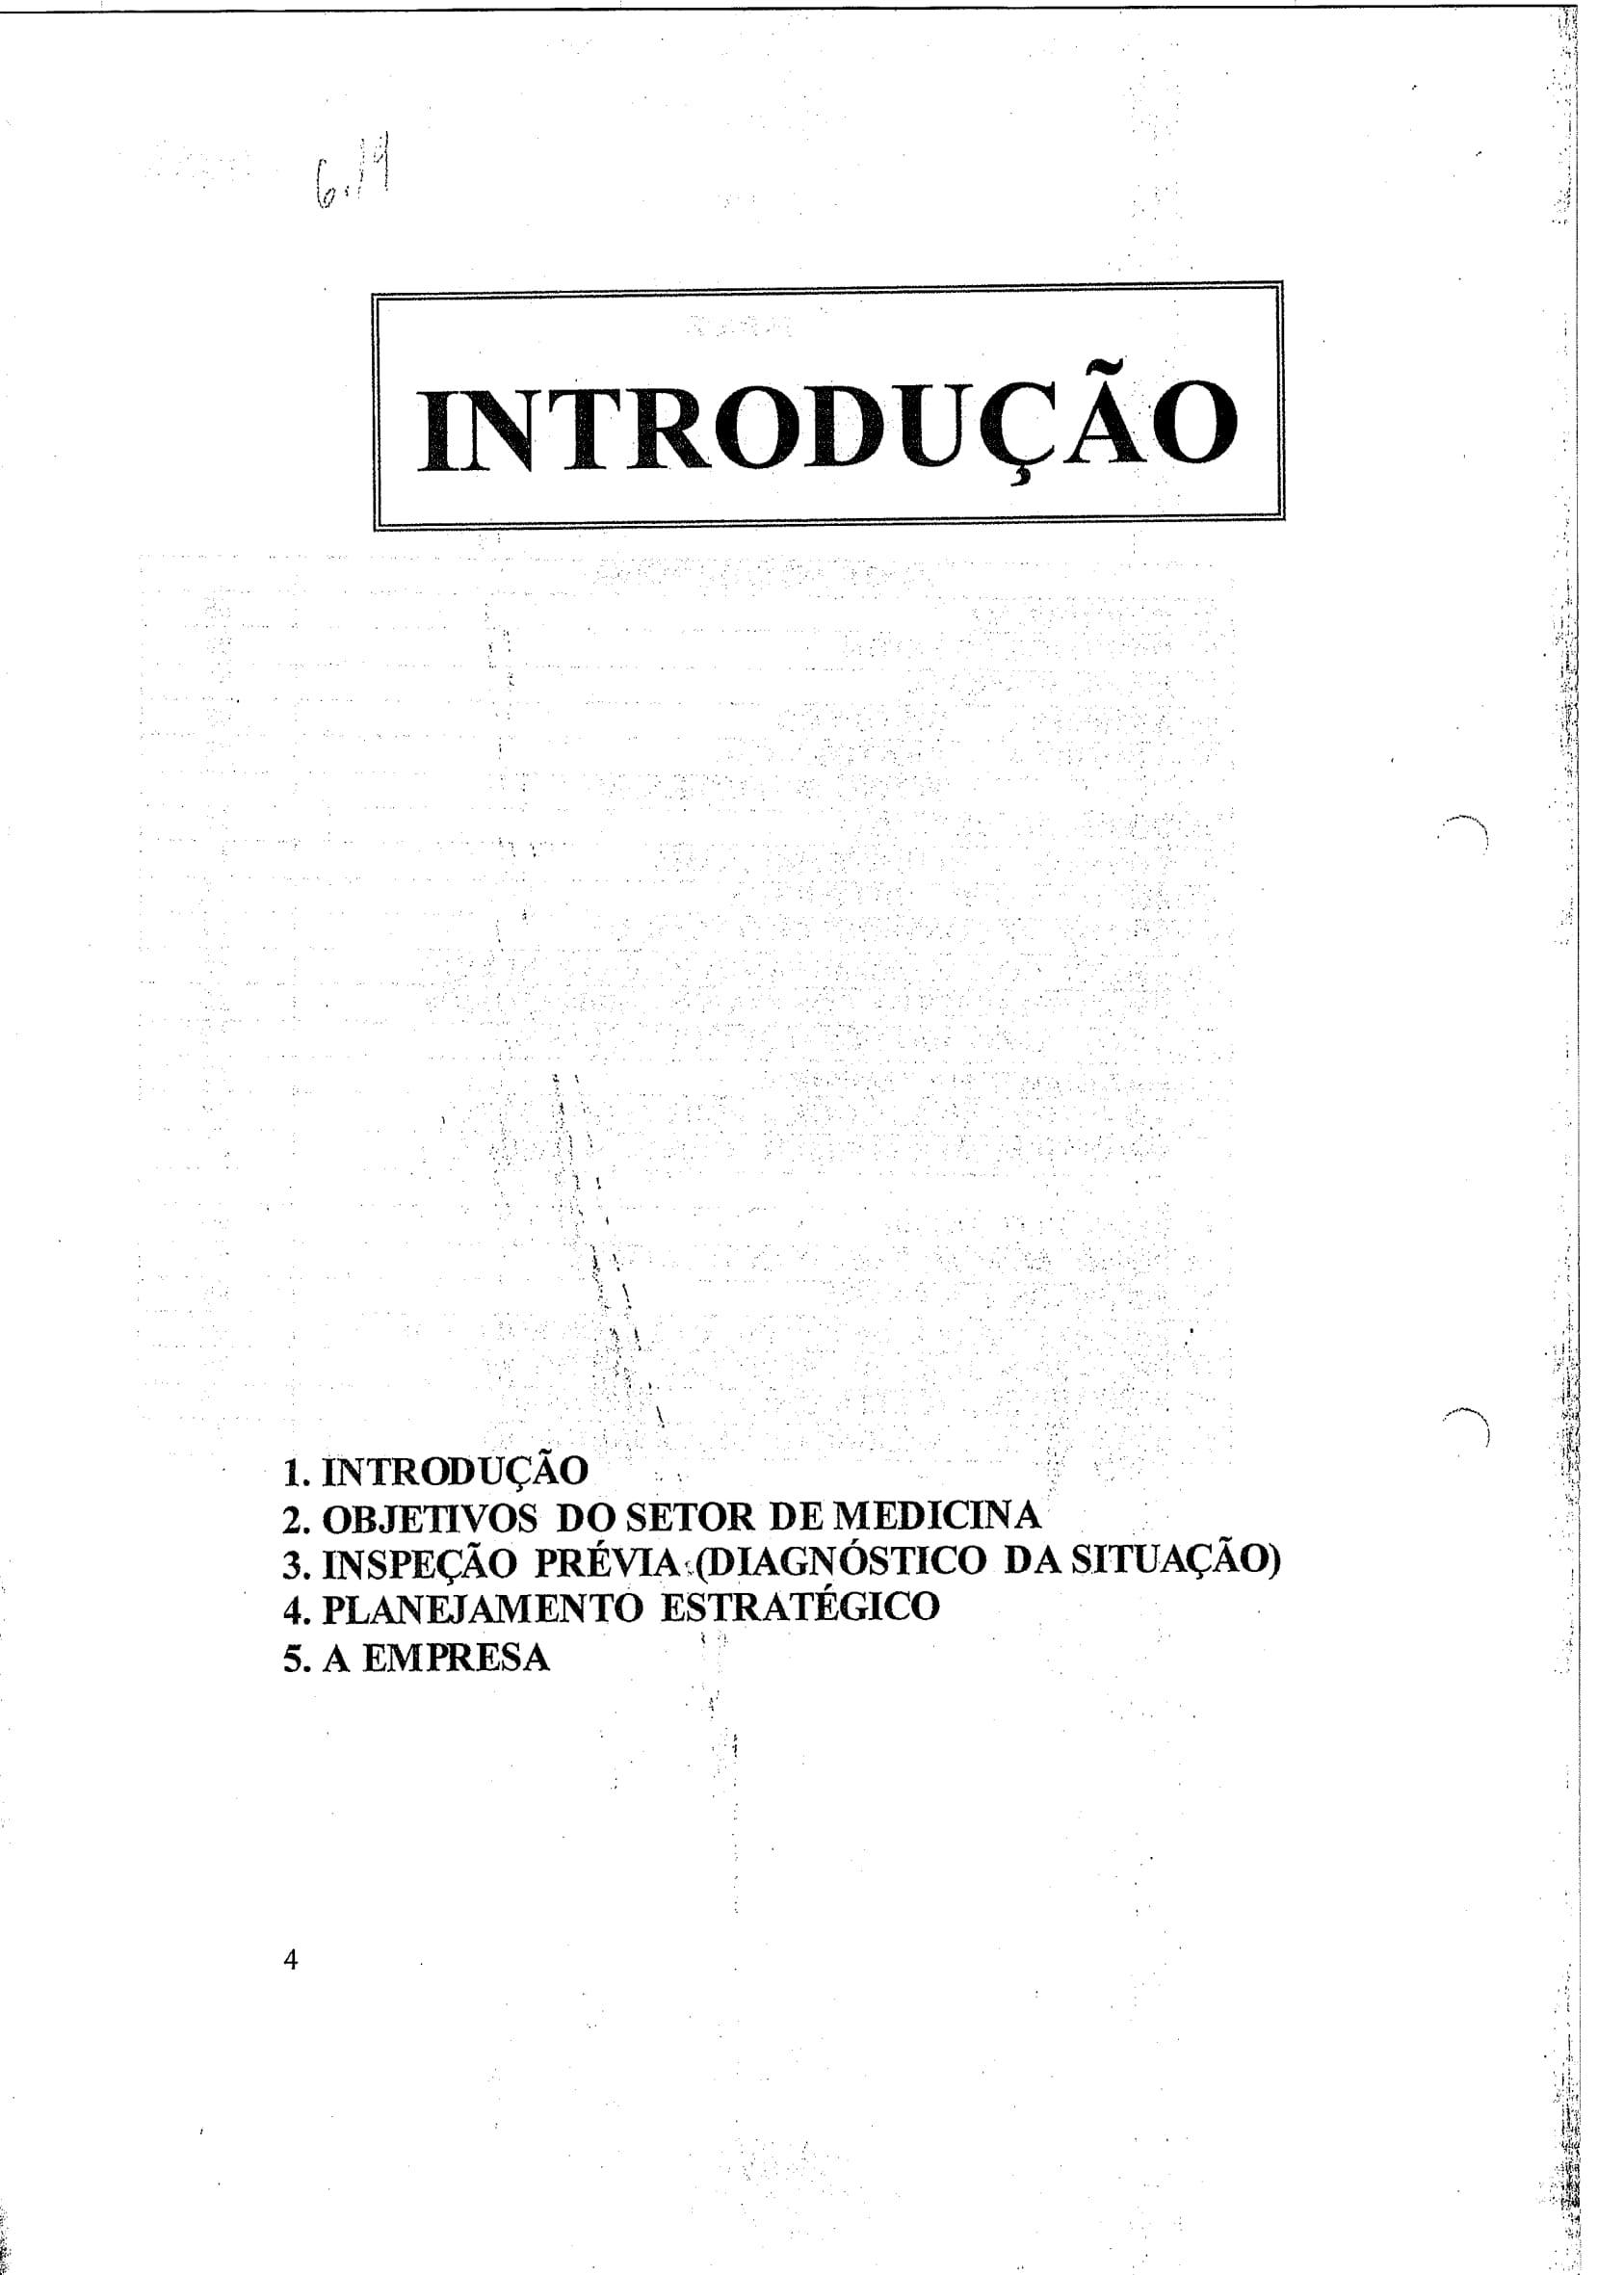 PL001222019-082